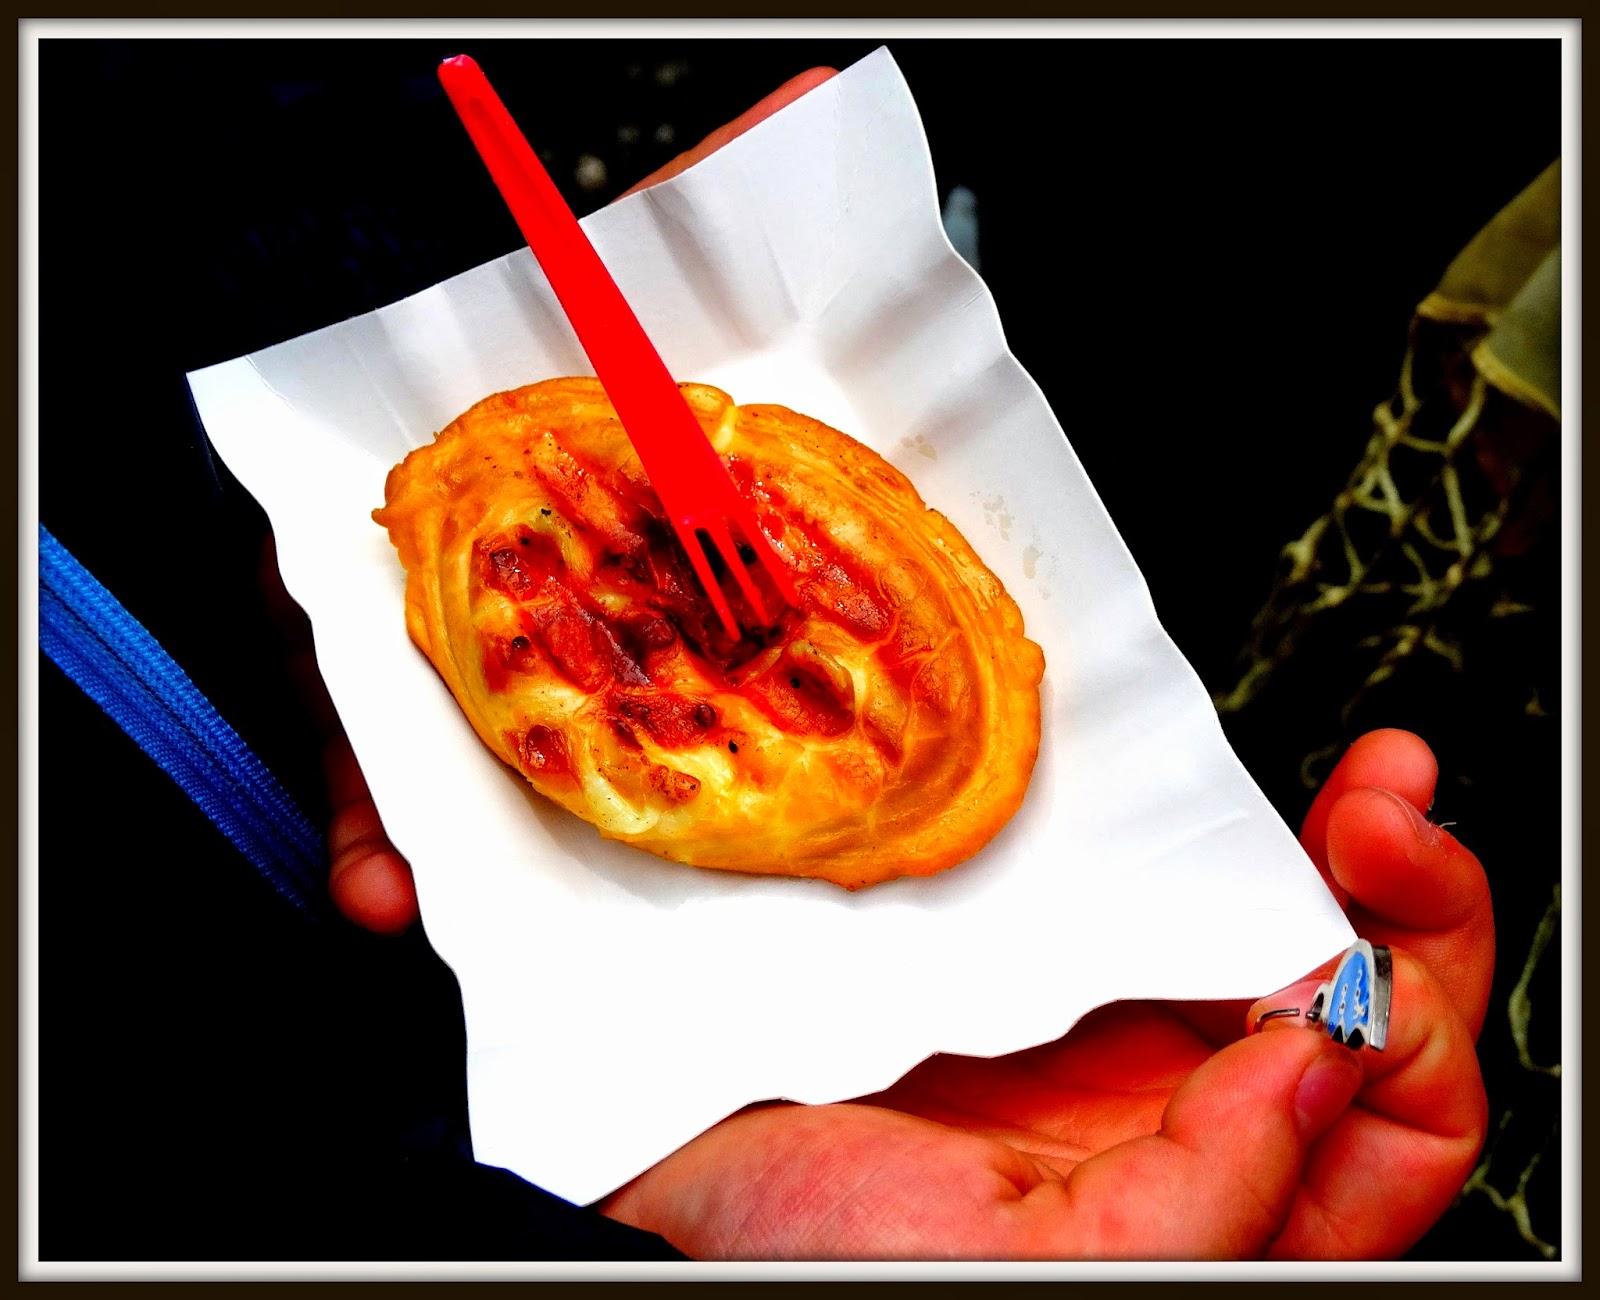 Targ Śniadaniowy, Park Krakowski, grillowany oscypek